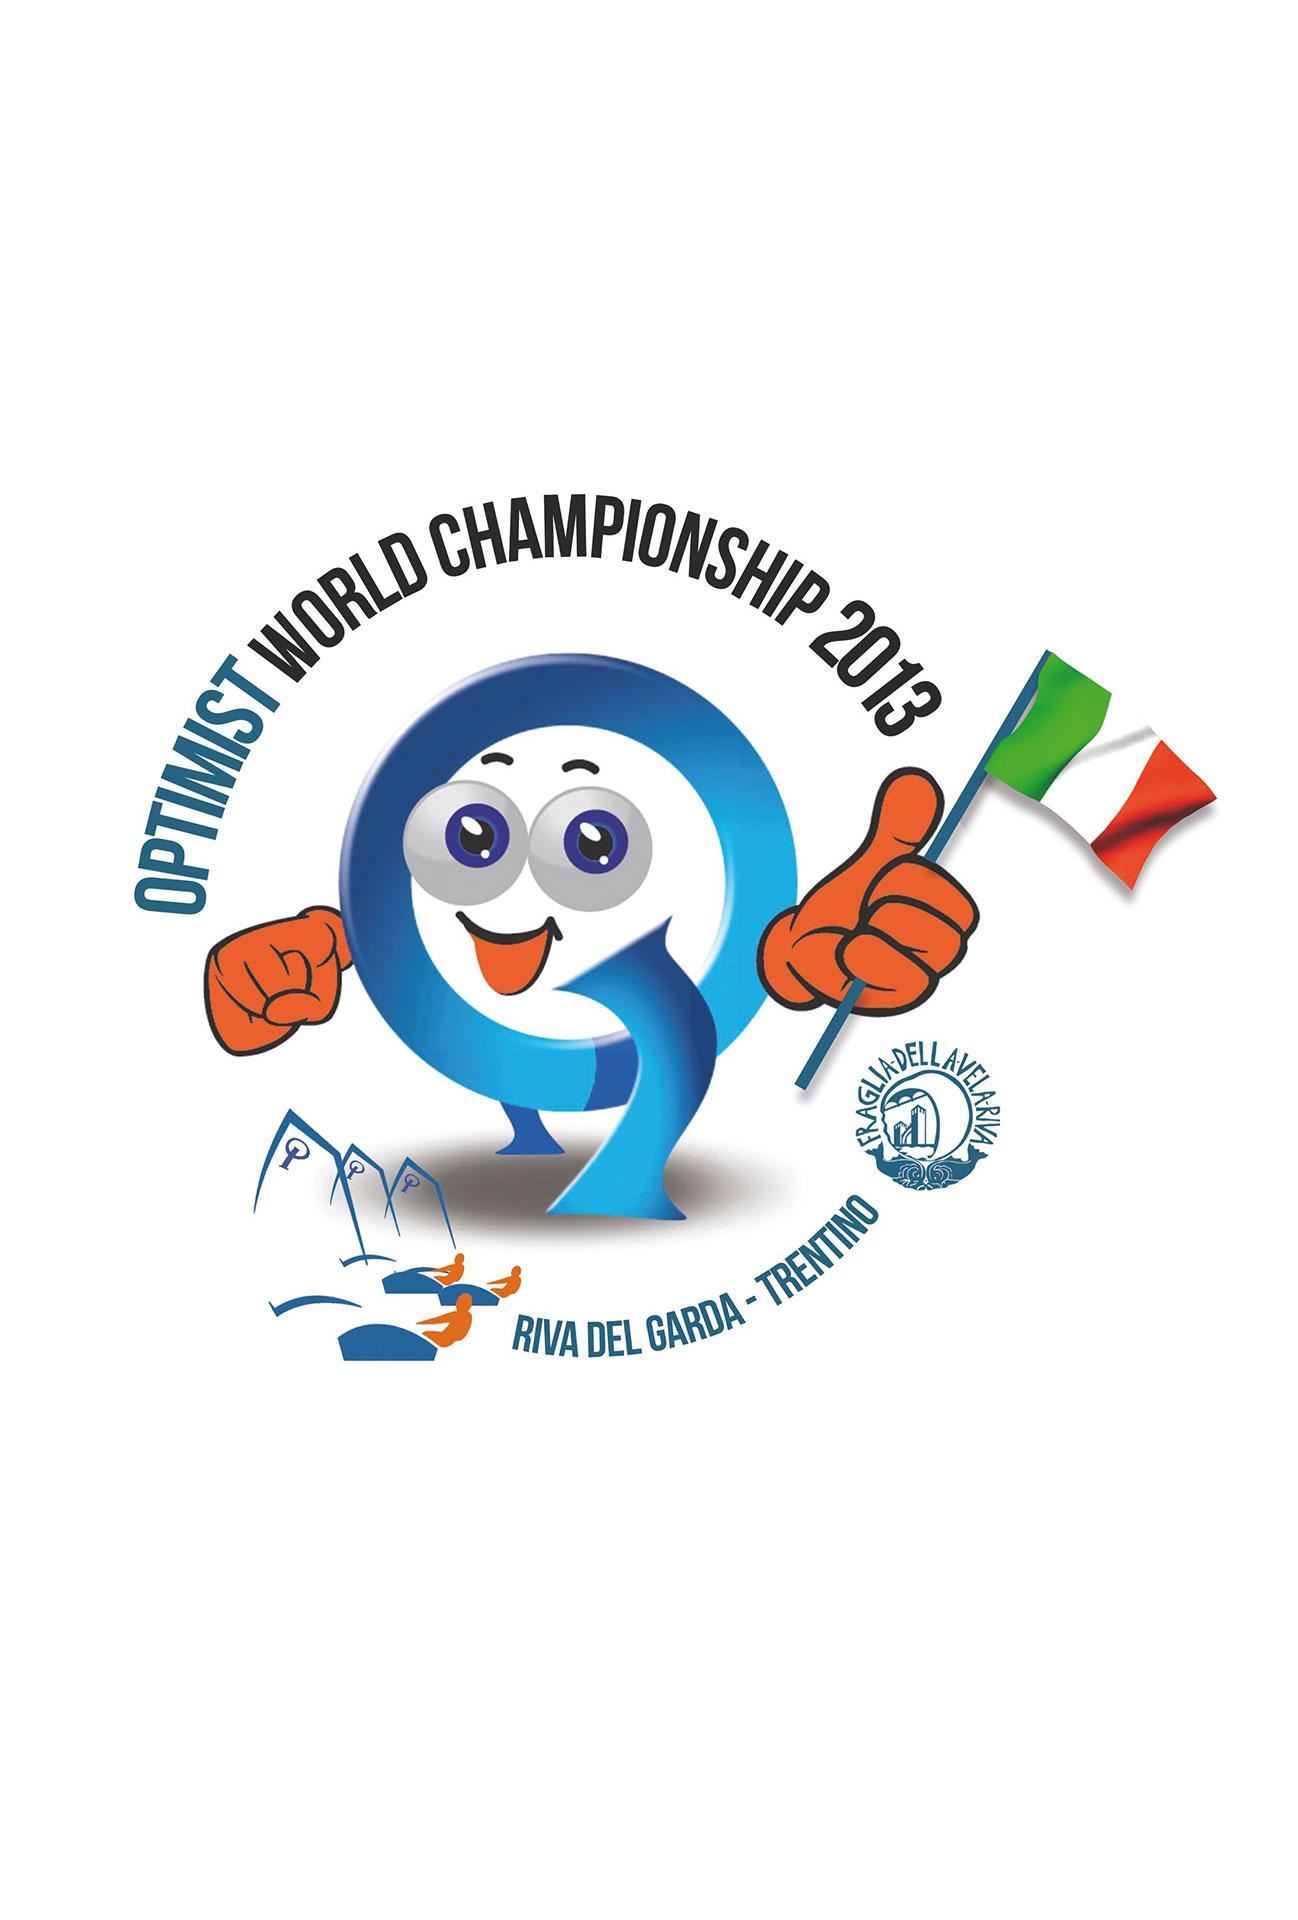 optimistworlds2013_logo_giolai_p